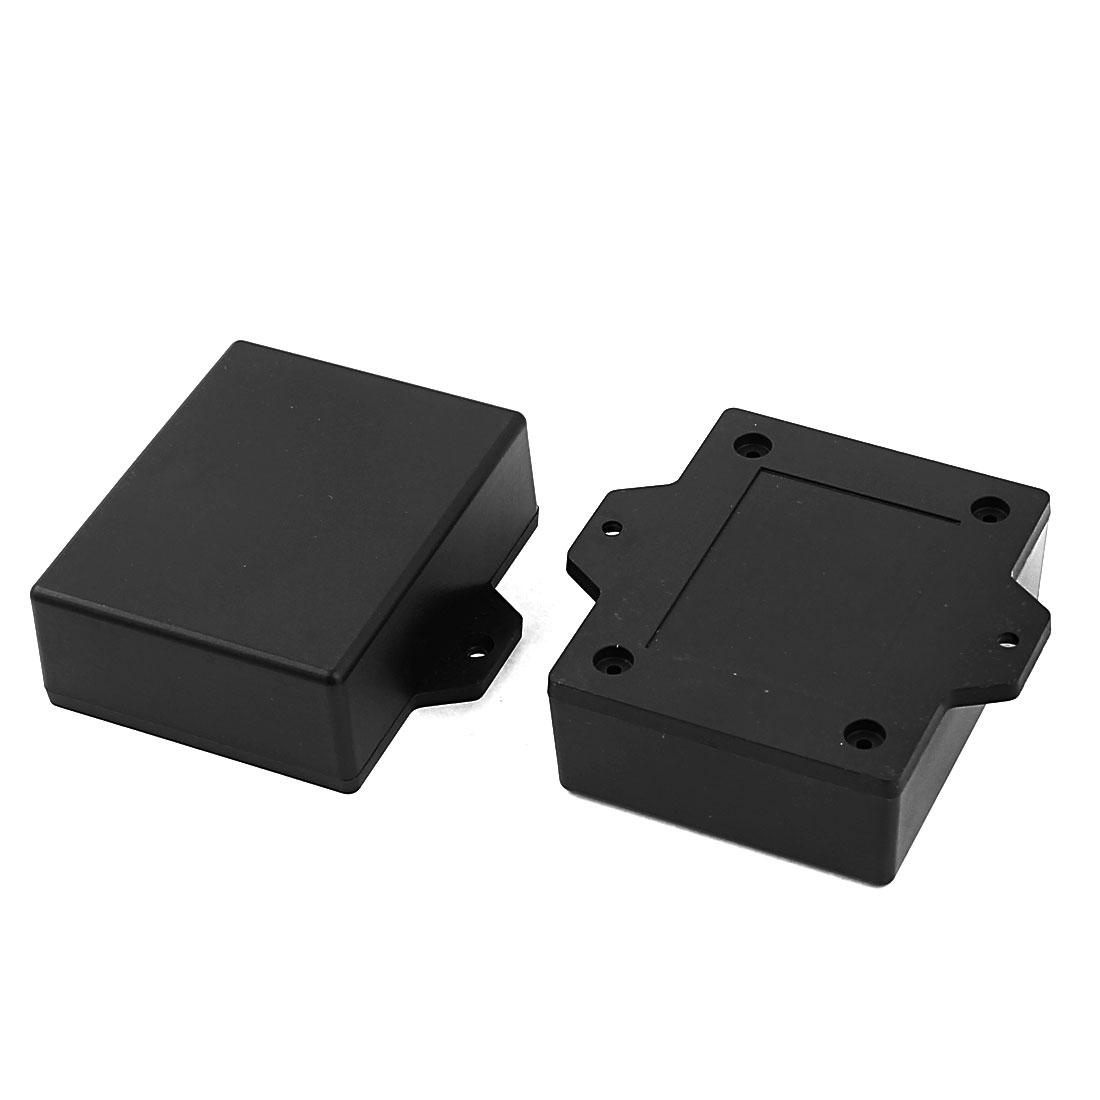 2pcs 62x50x23mm Rectangular Plastic Enclosure Case Junction Box Black